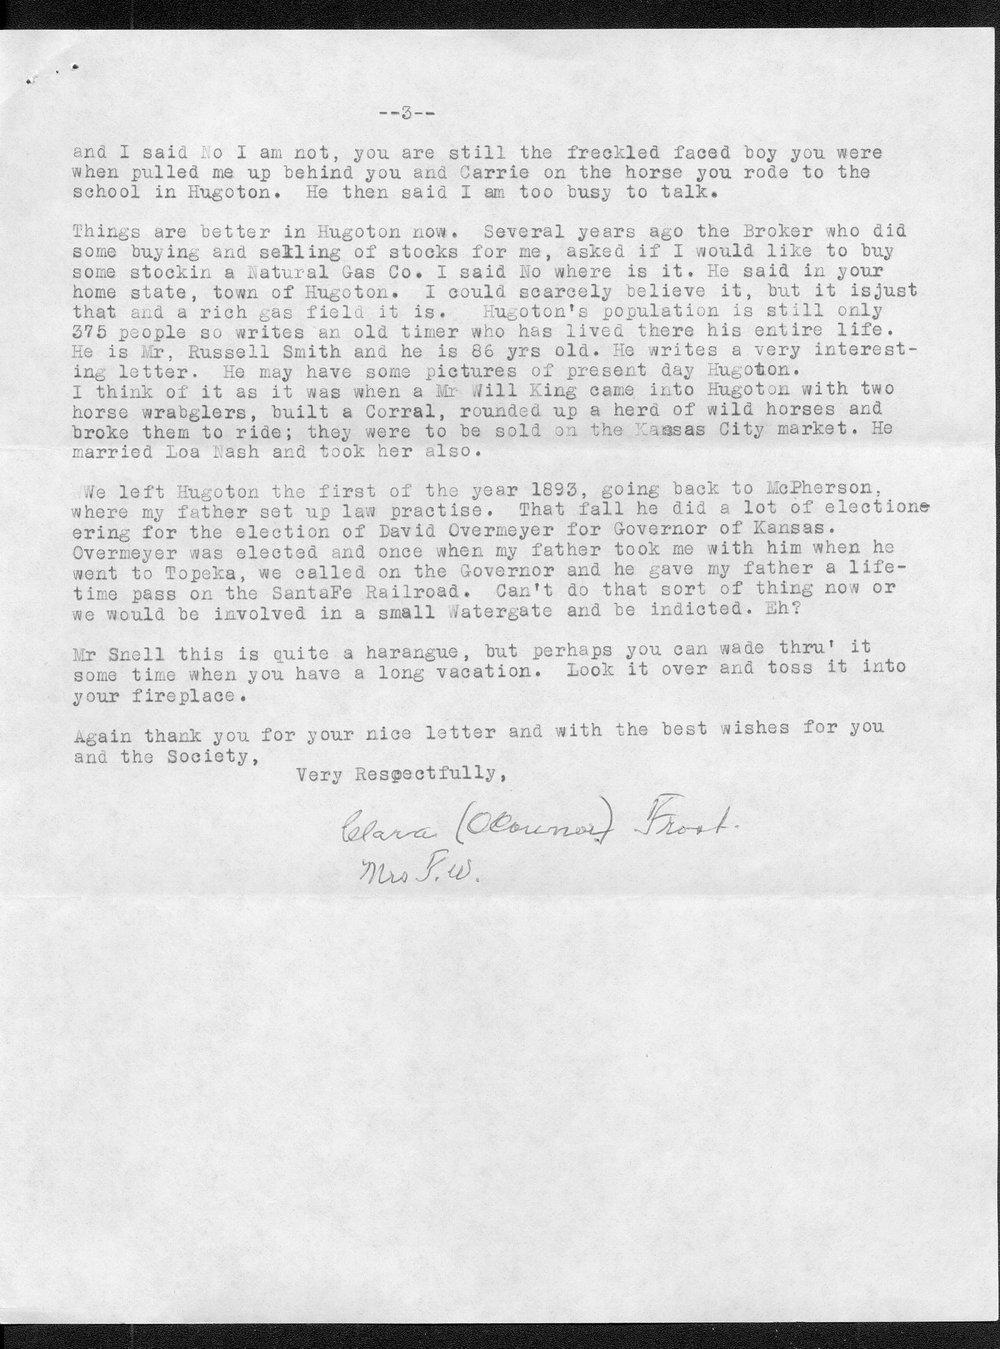 Clara Frost to Joseph Snell - 3